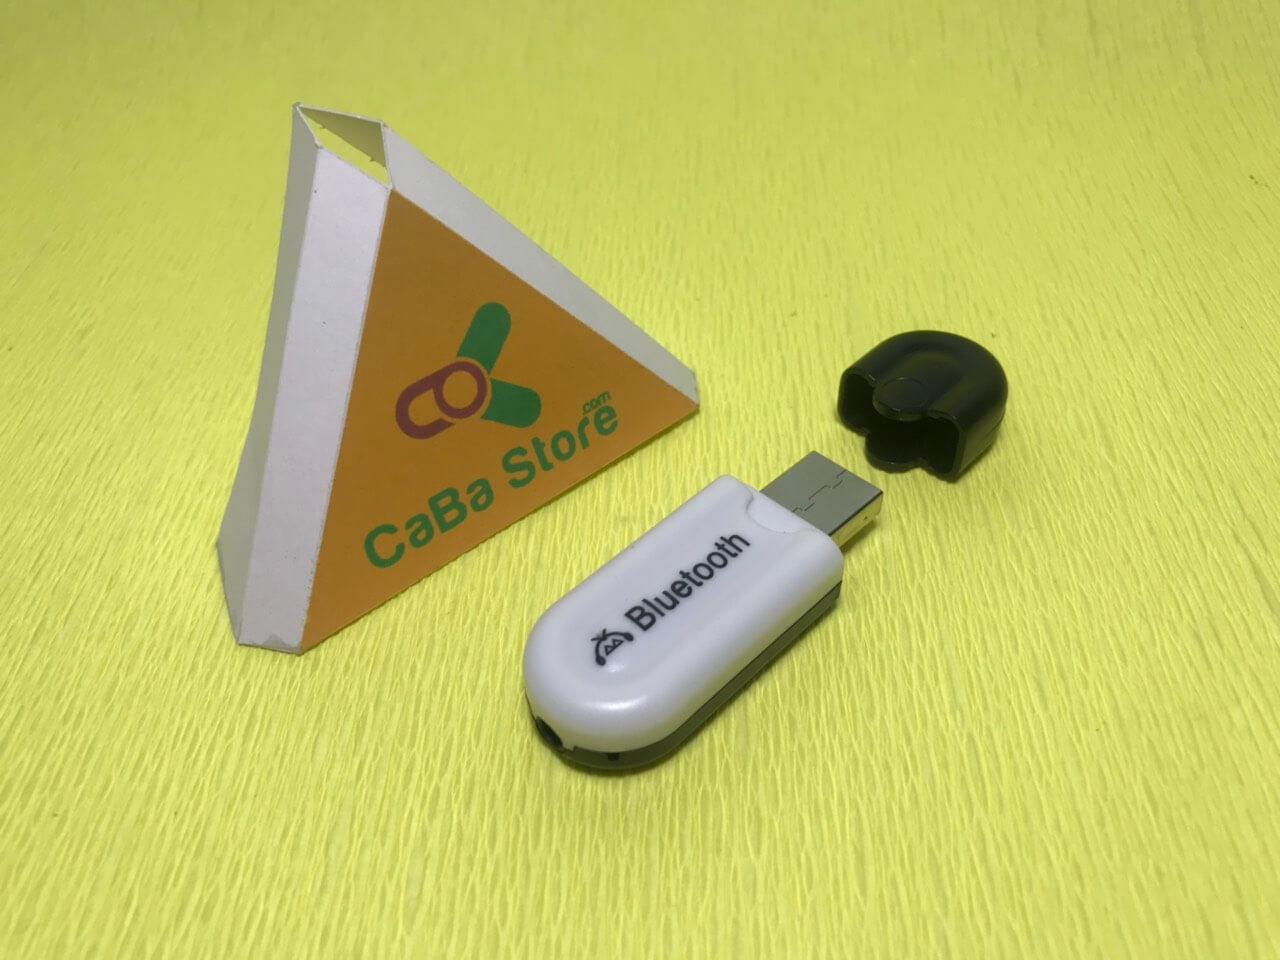 USB Bluetooth cho loa HJX001 - Biến loa thường thành loa Bluetooth